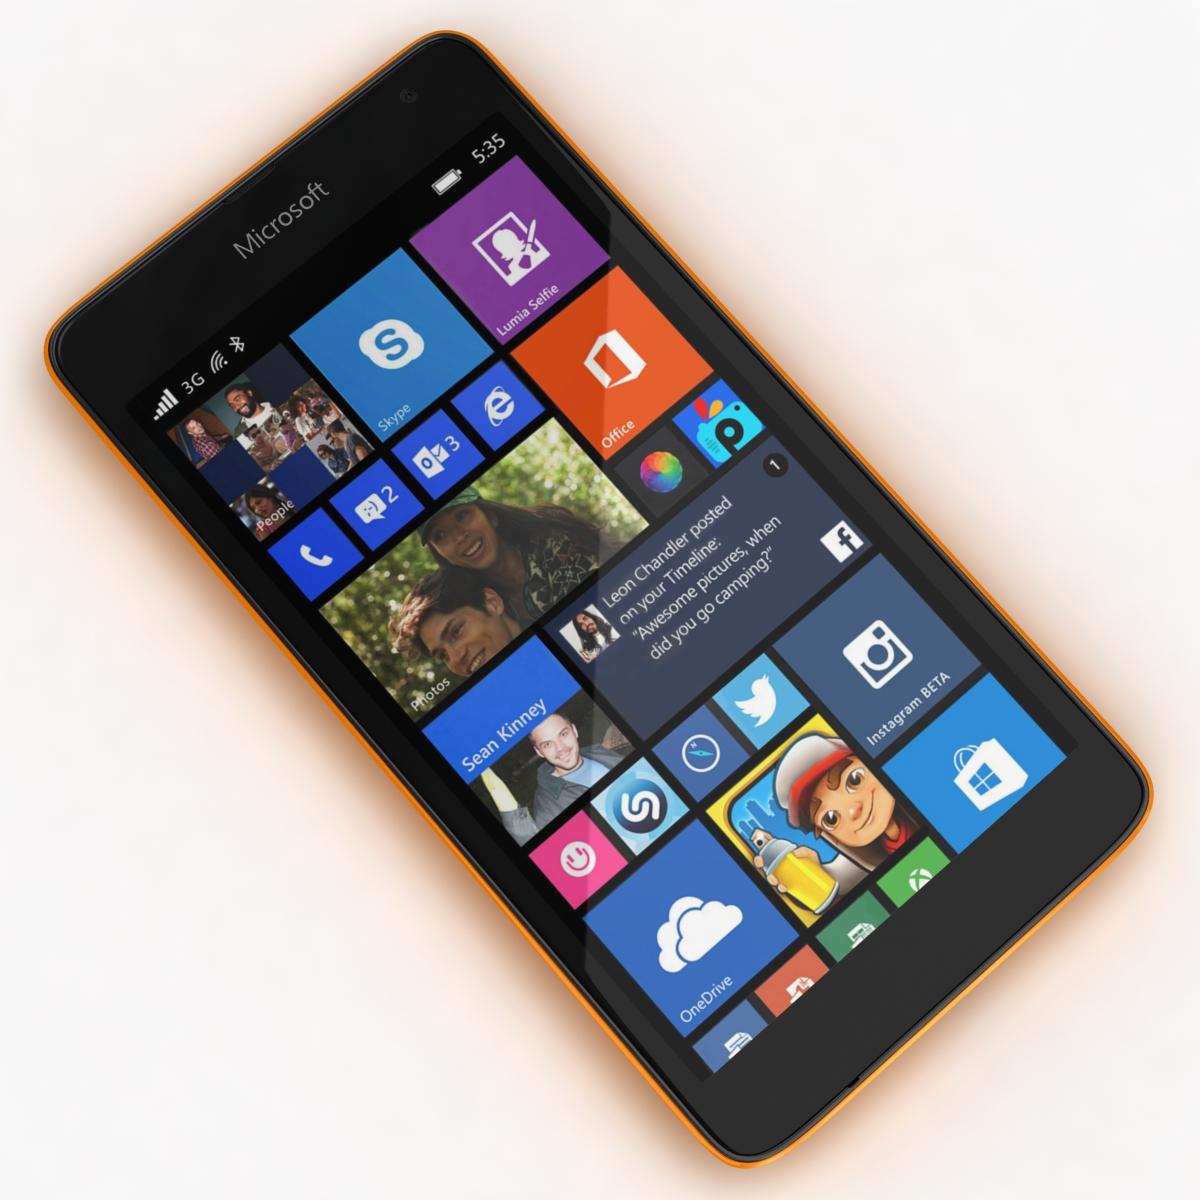 microsoft lumia 535 and dual sim orange 3d model 3ds max fbx c4d obj 204108